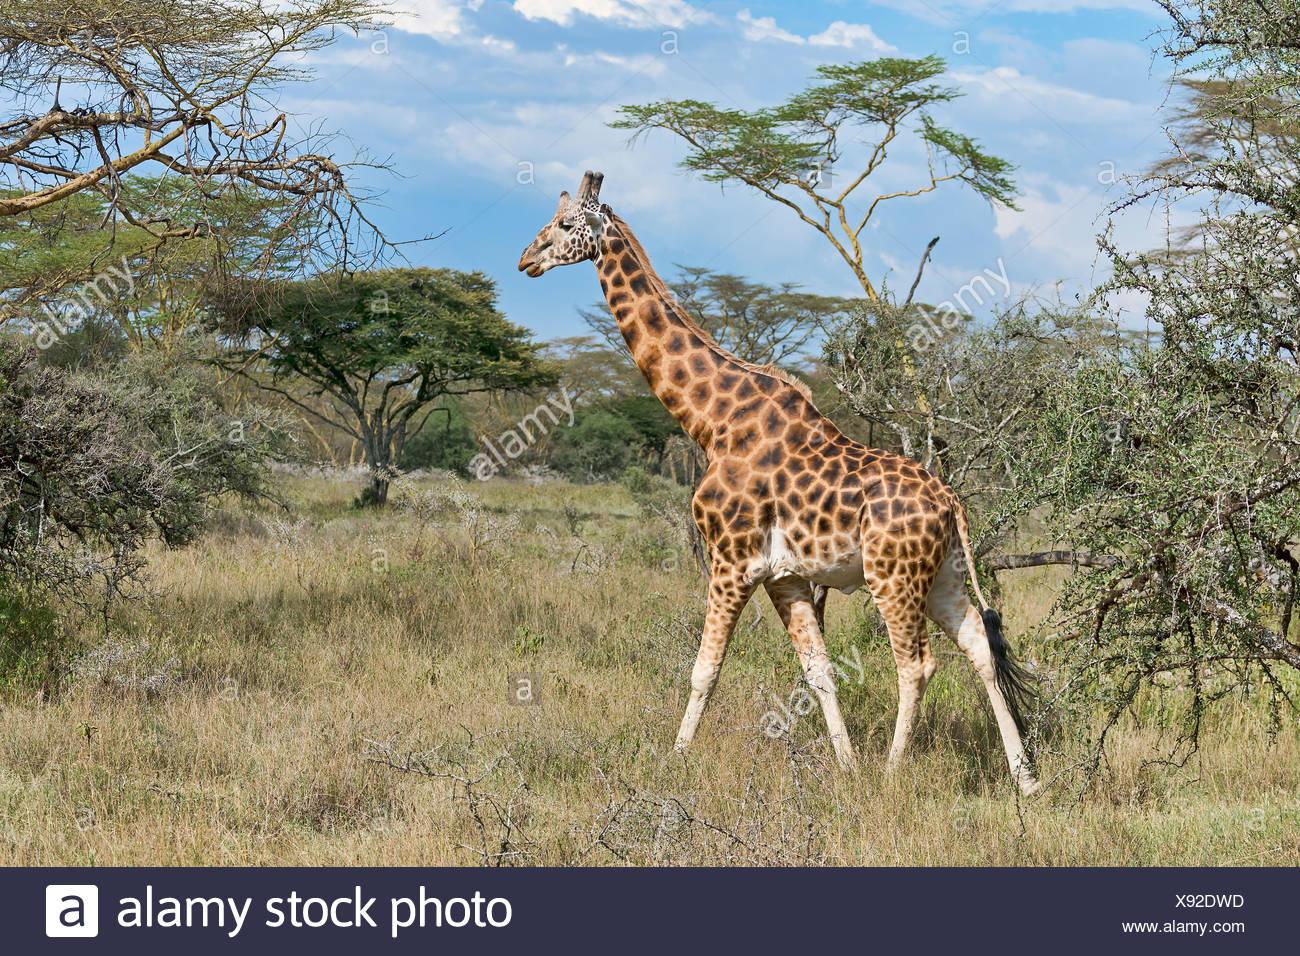 Rothschild's giraffe (Giraffa camelopardalis camelopardis) walking in bushland, Lake Nakuru National Park, Kenya - Stock Image